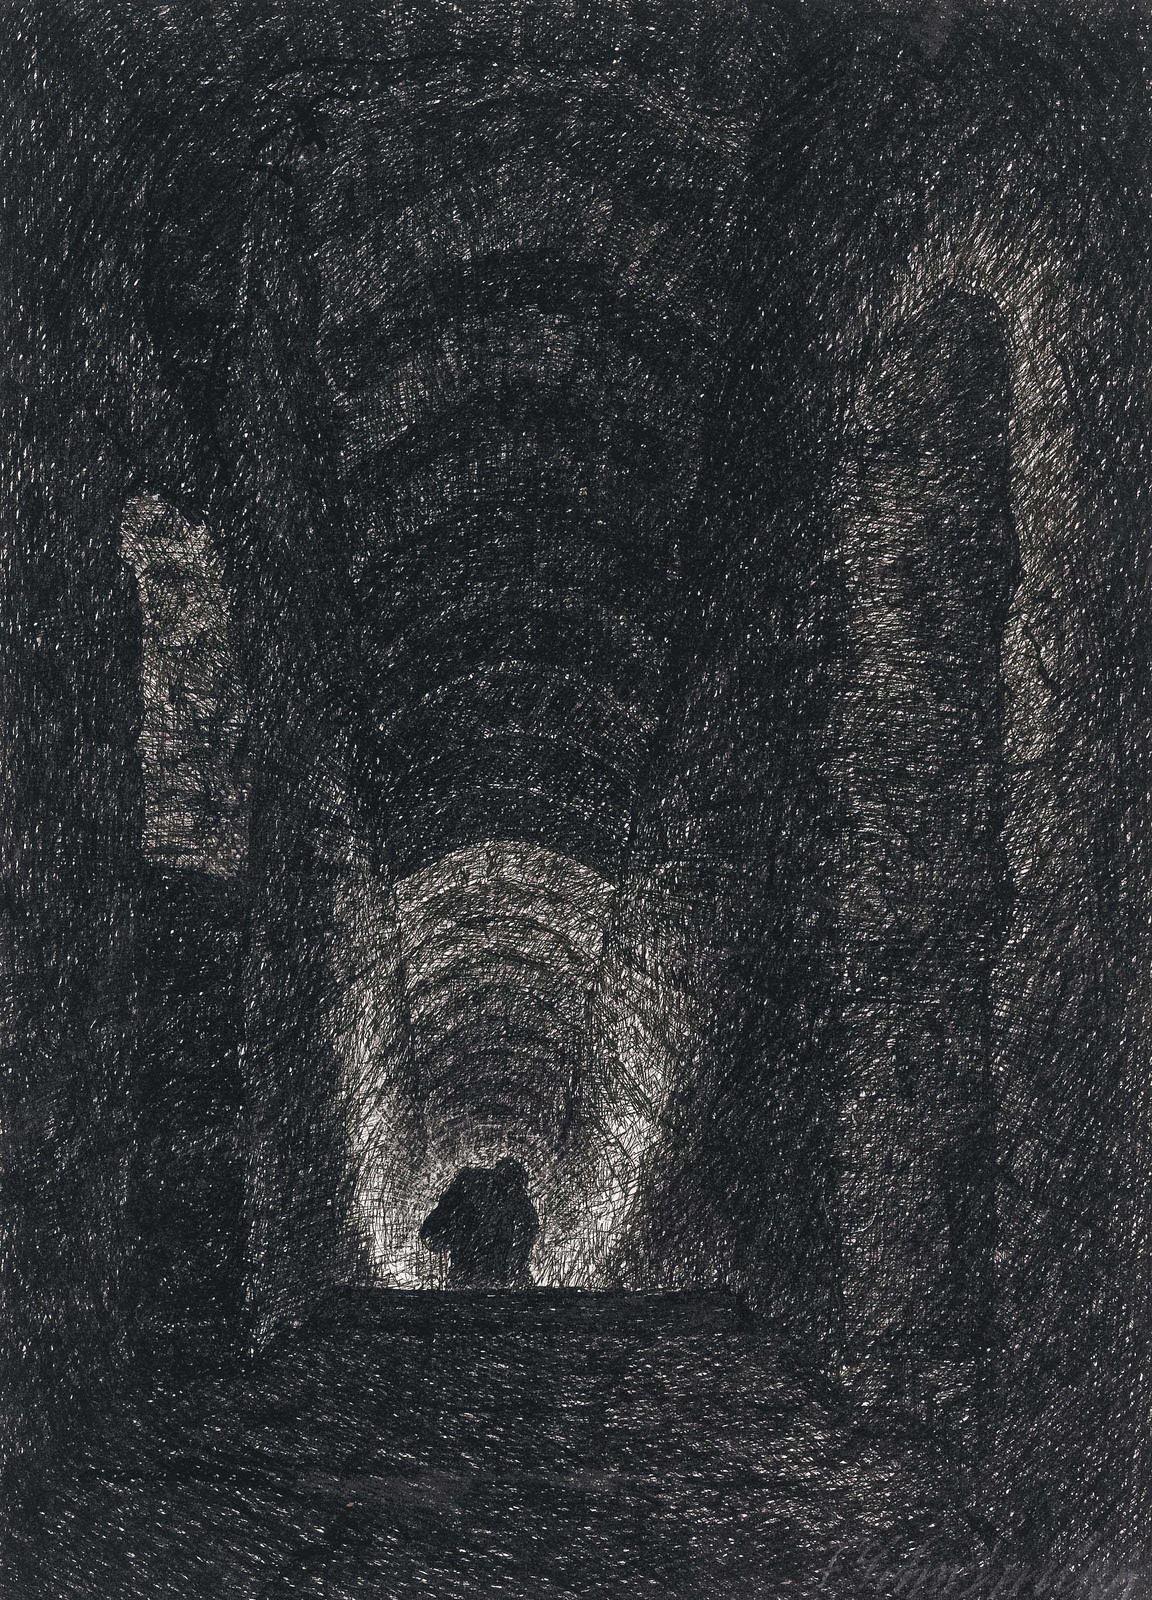 Fritz Schwimbeck - Golem, Dark Corridors